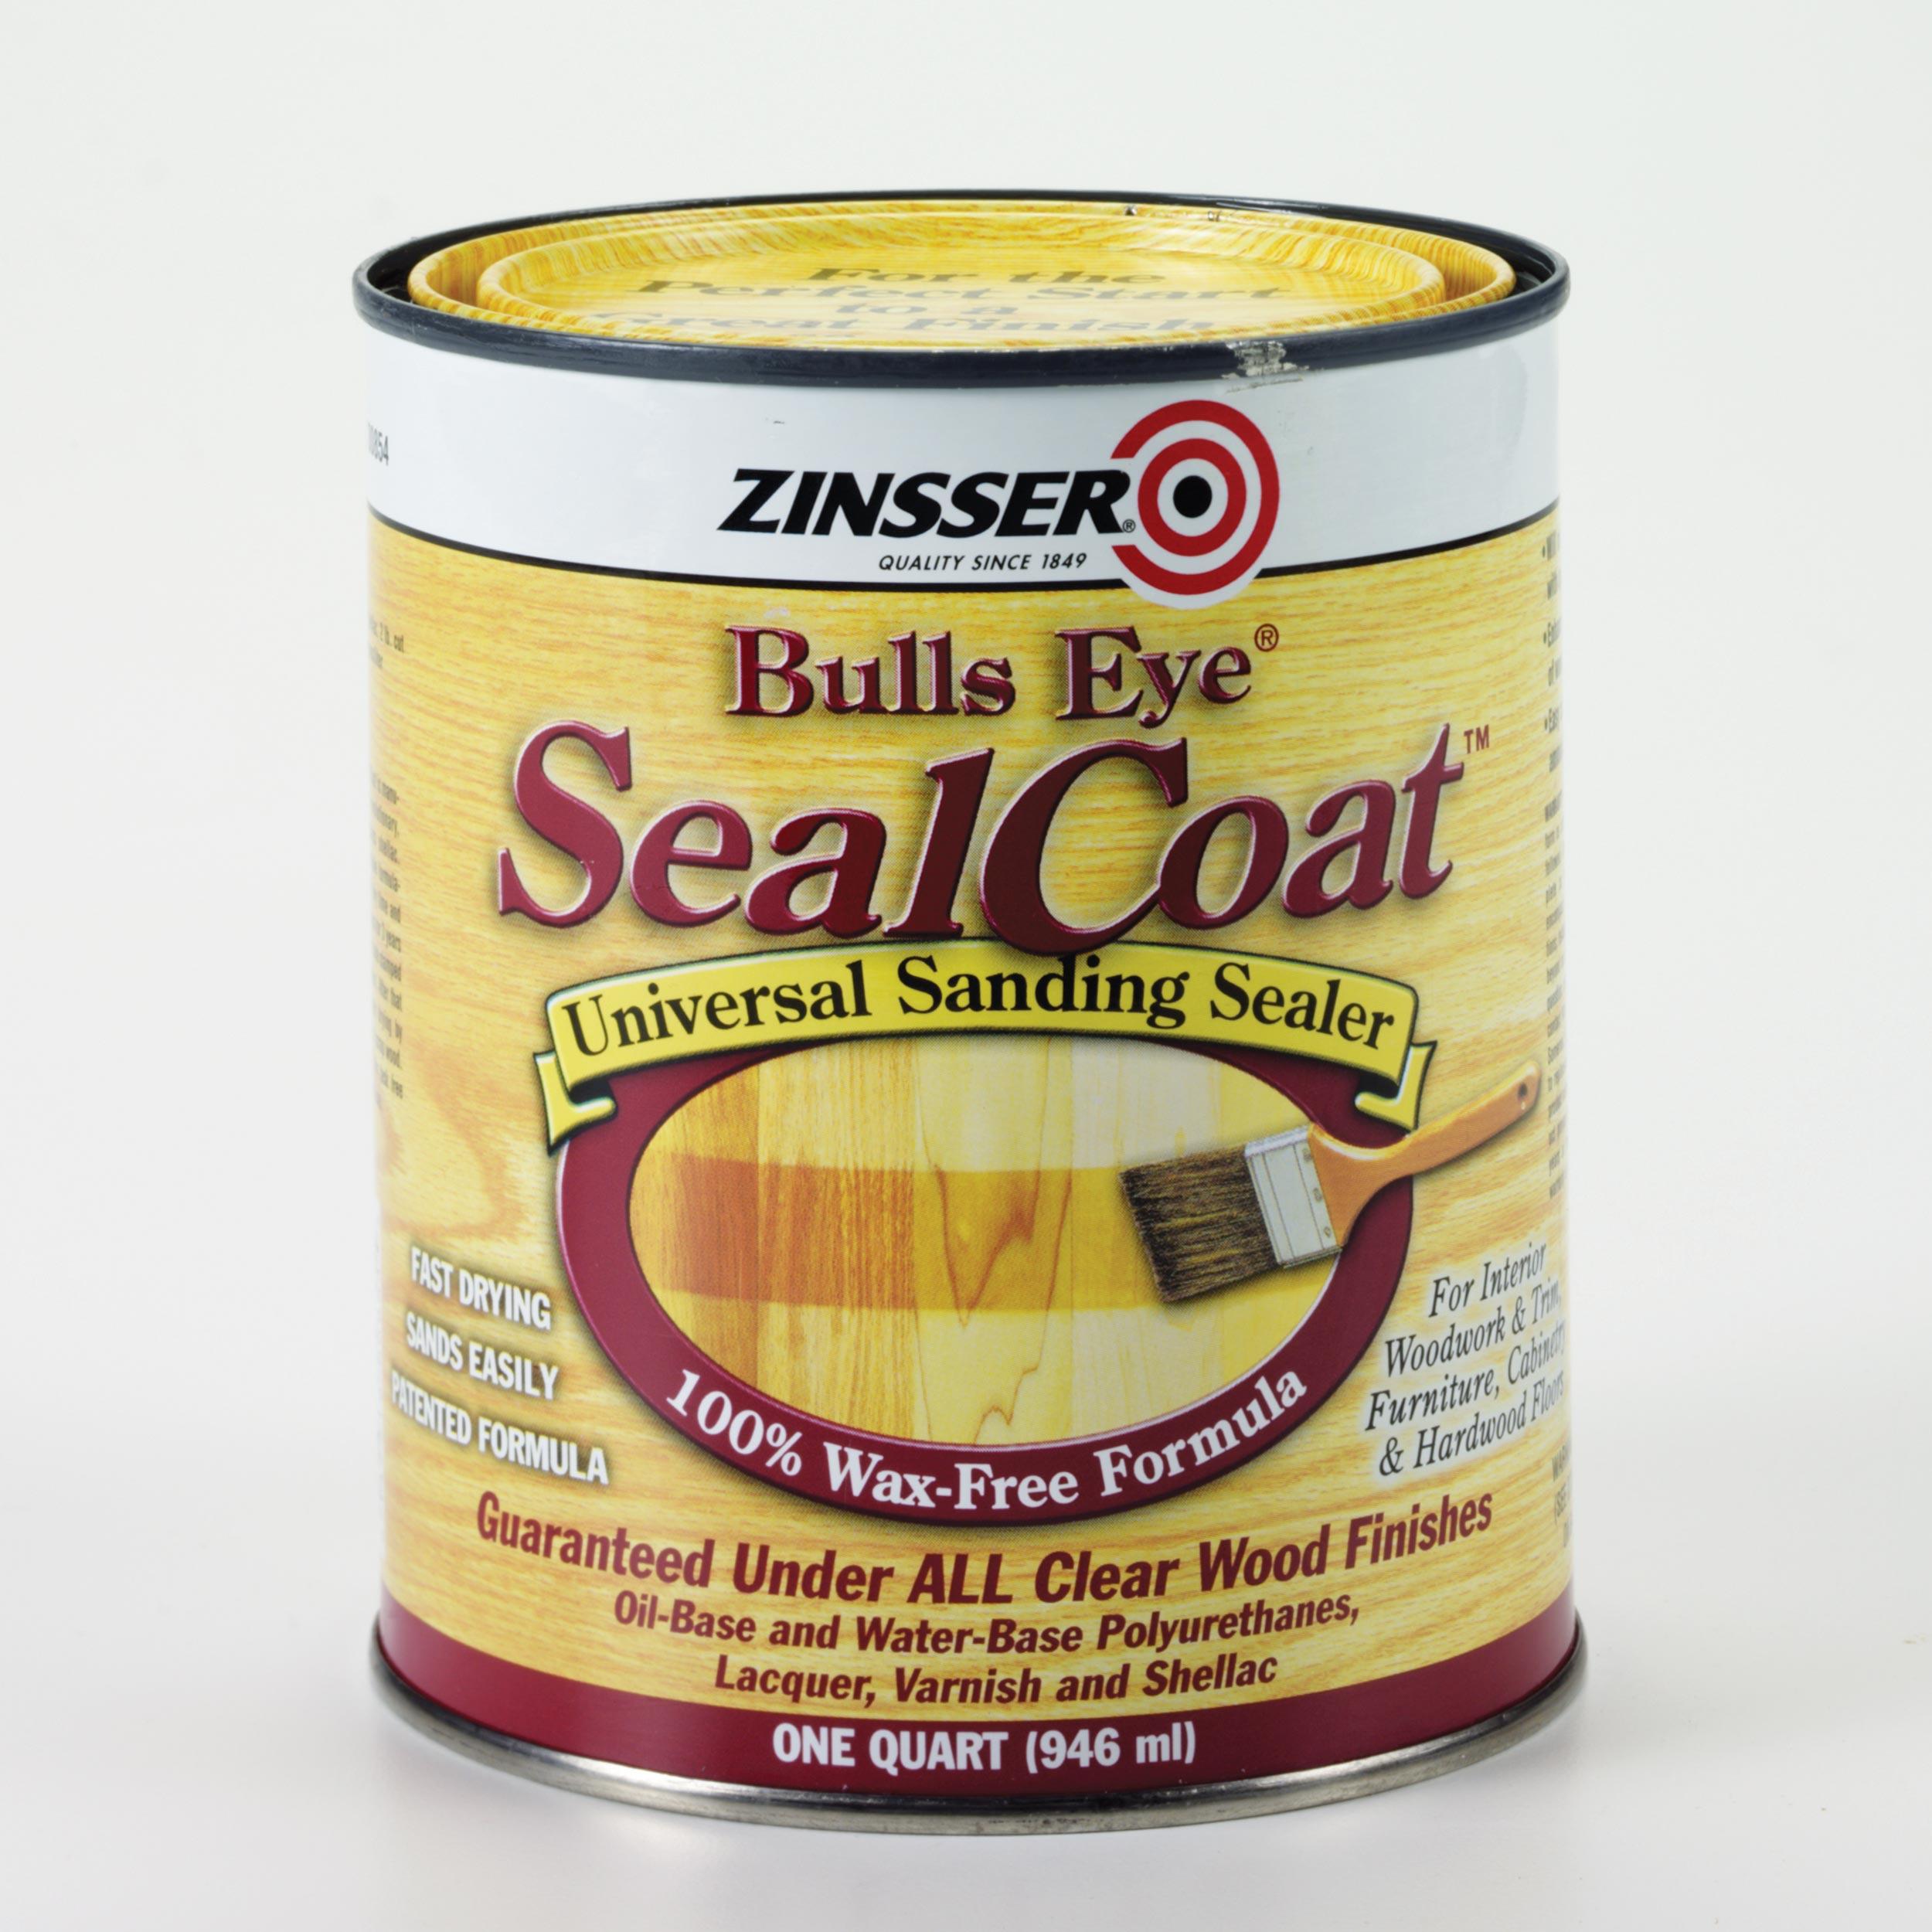 Rust-Oleum 00854 Sealcoat Universal Sanding Sealer, Sealer